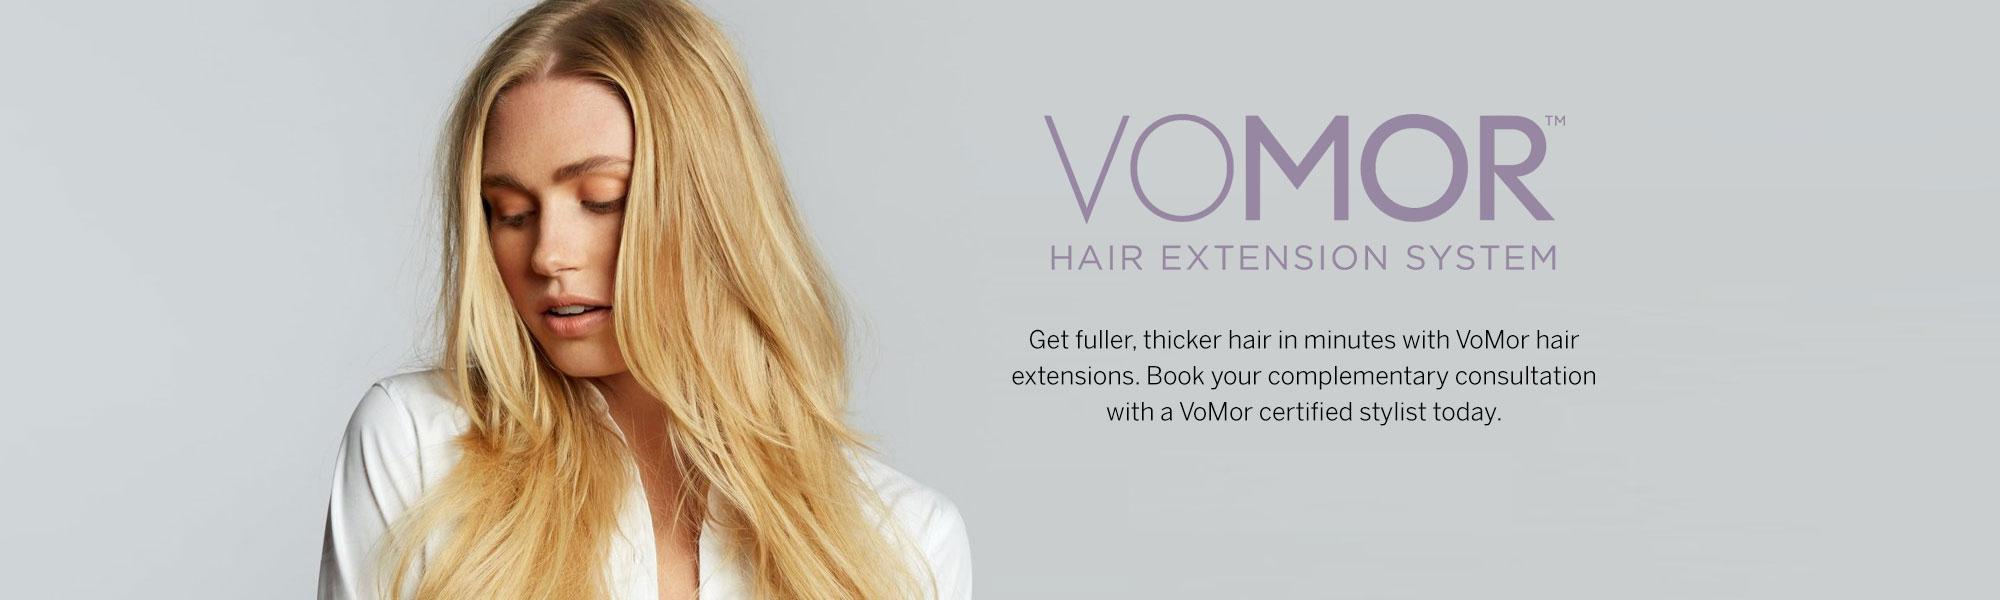 Dosha Salon Spa - VoMor™ Hair Extensions